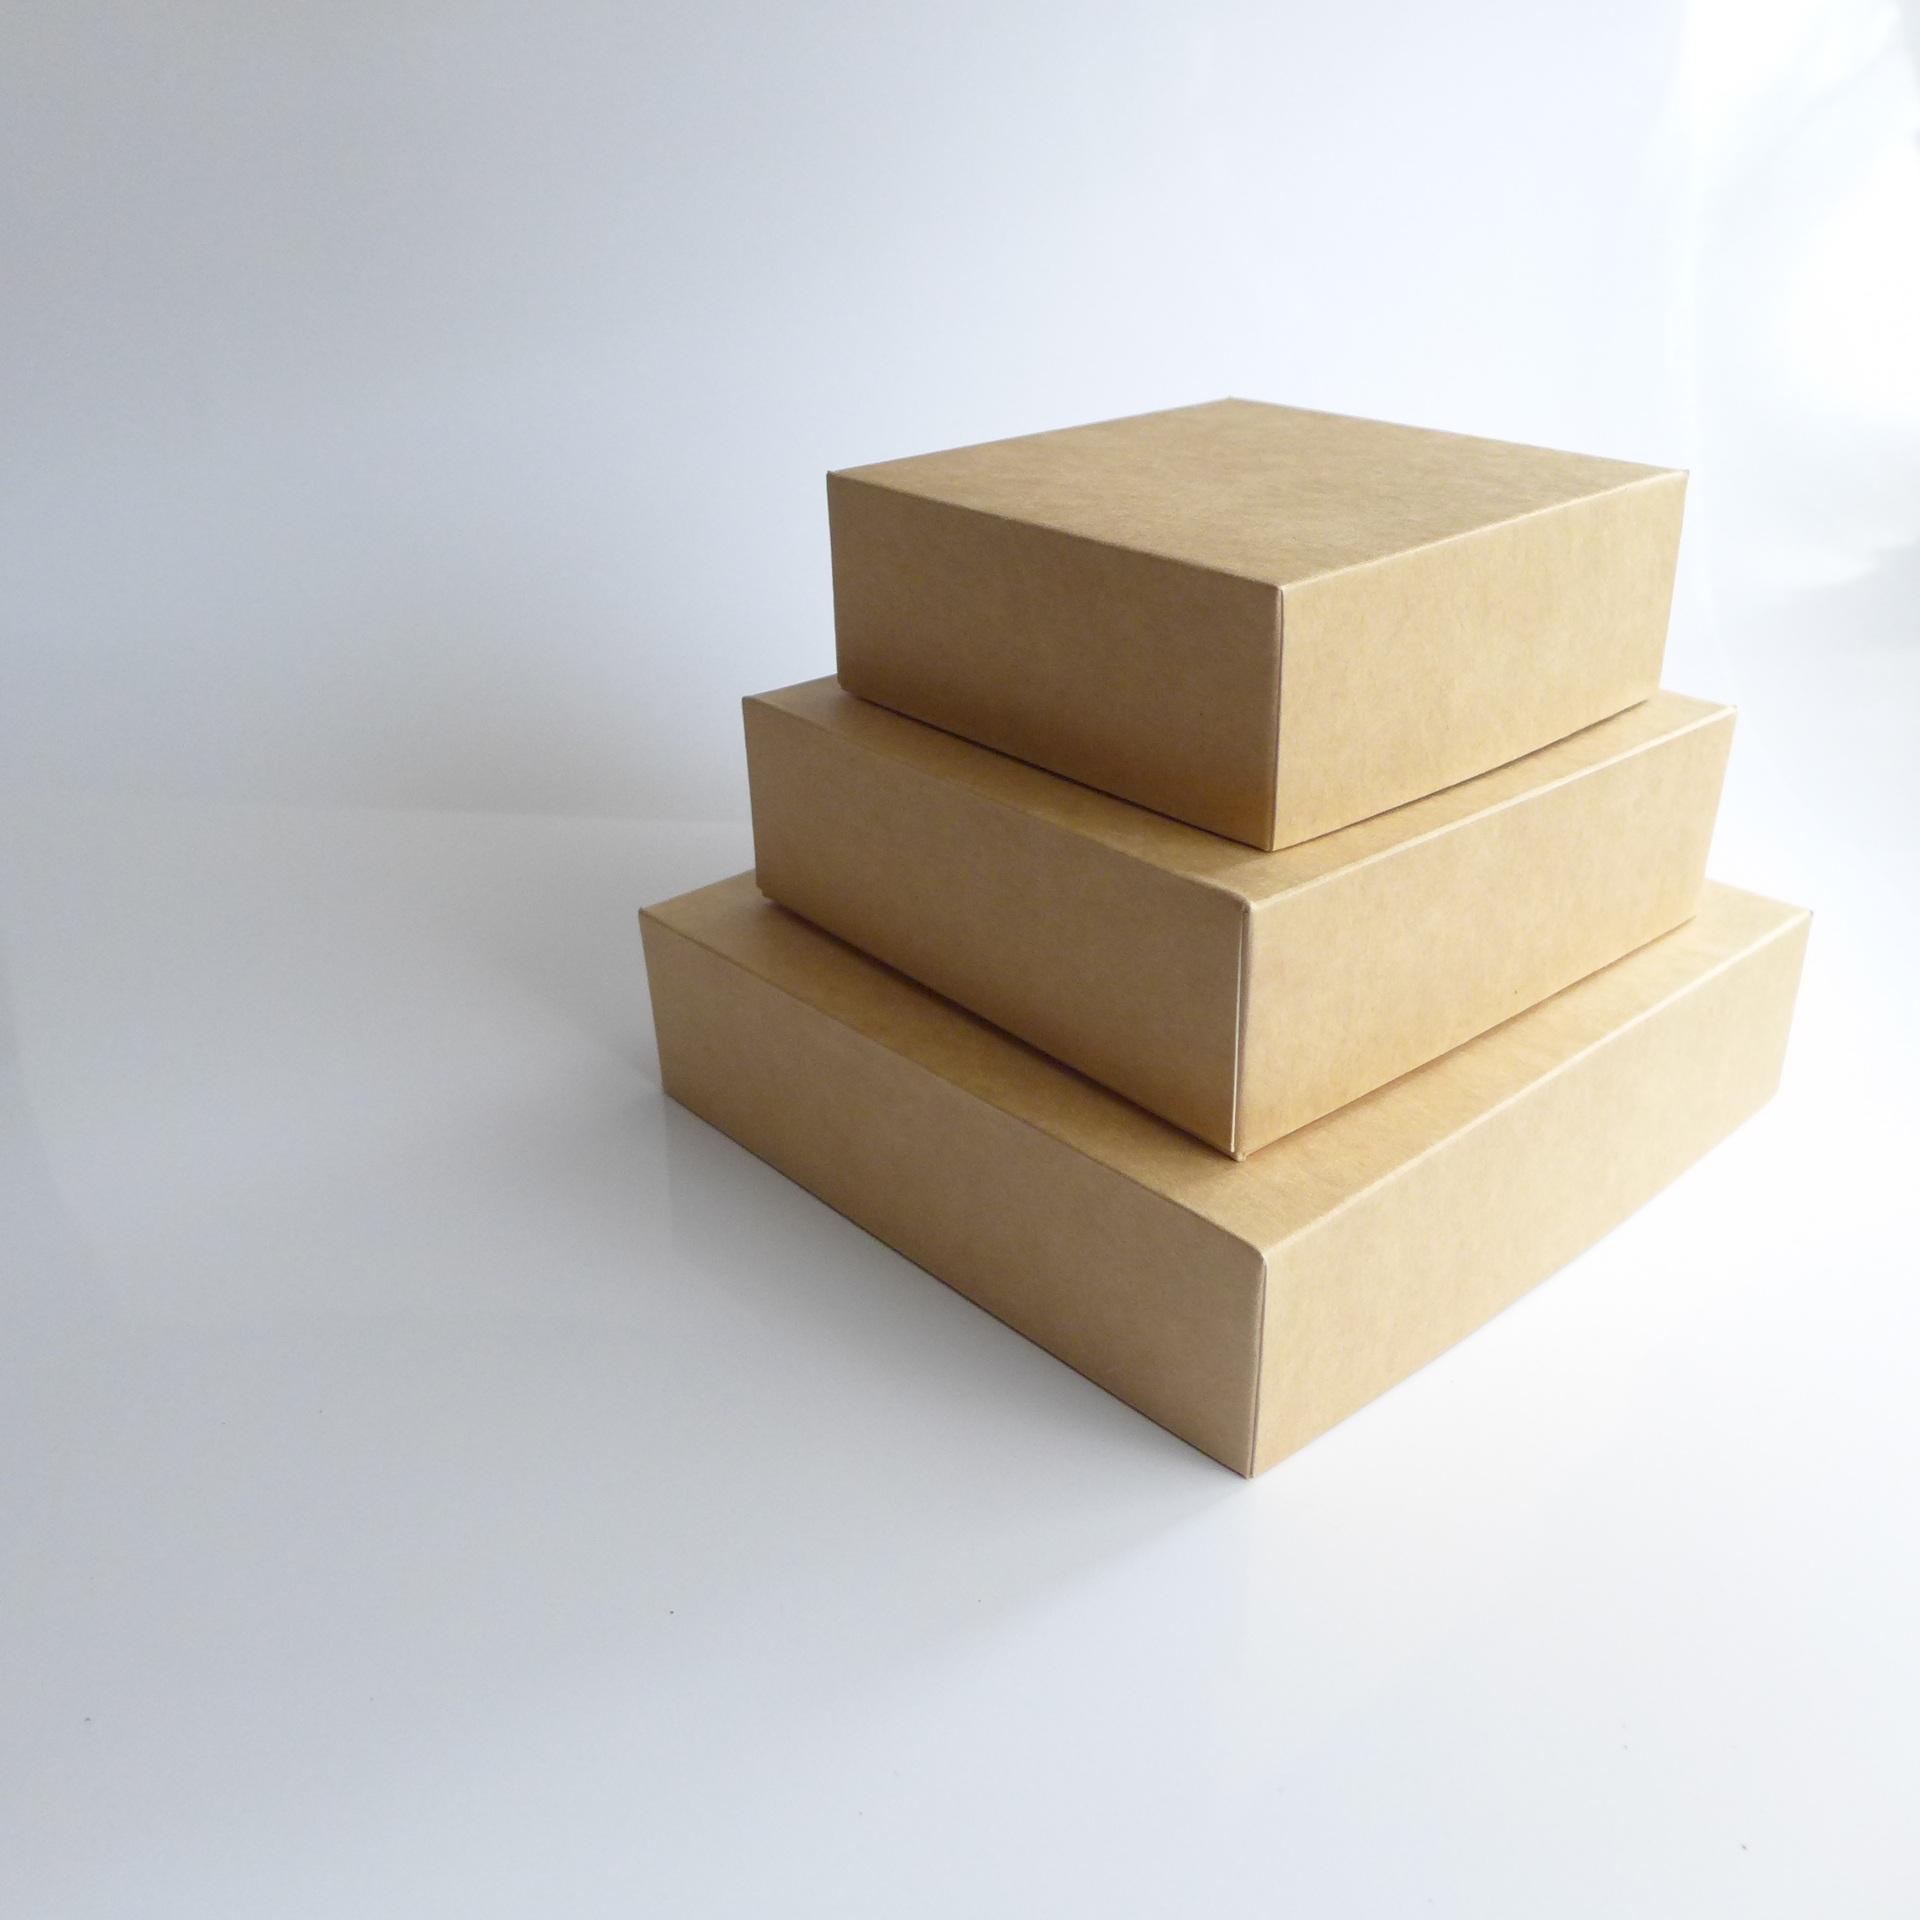 Creative Wood Celebration Gift Box Paper Present Crafts Design Rectangle Handmade Event Carton Greeting Arts And